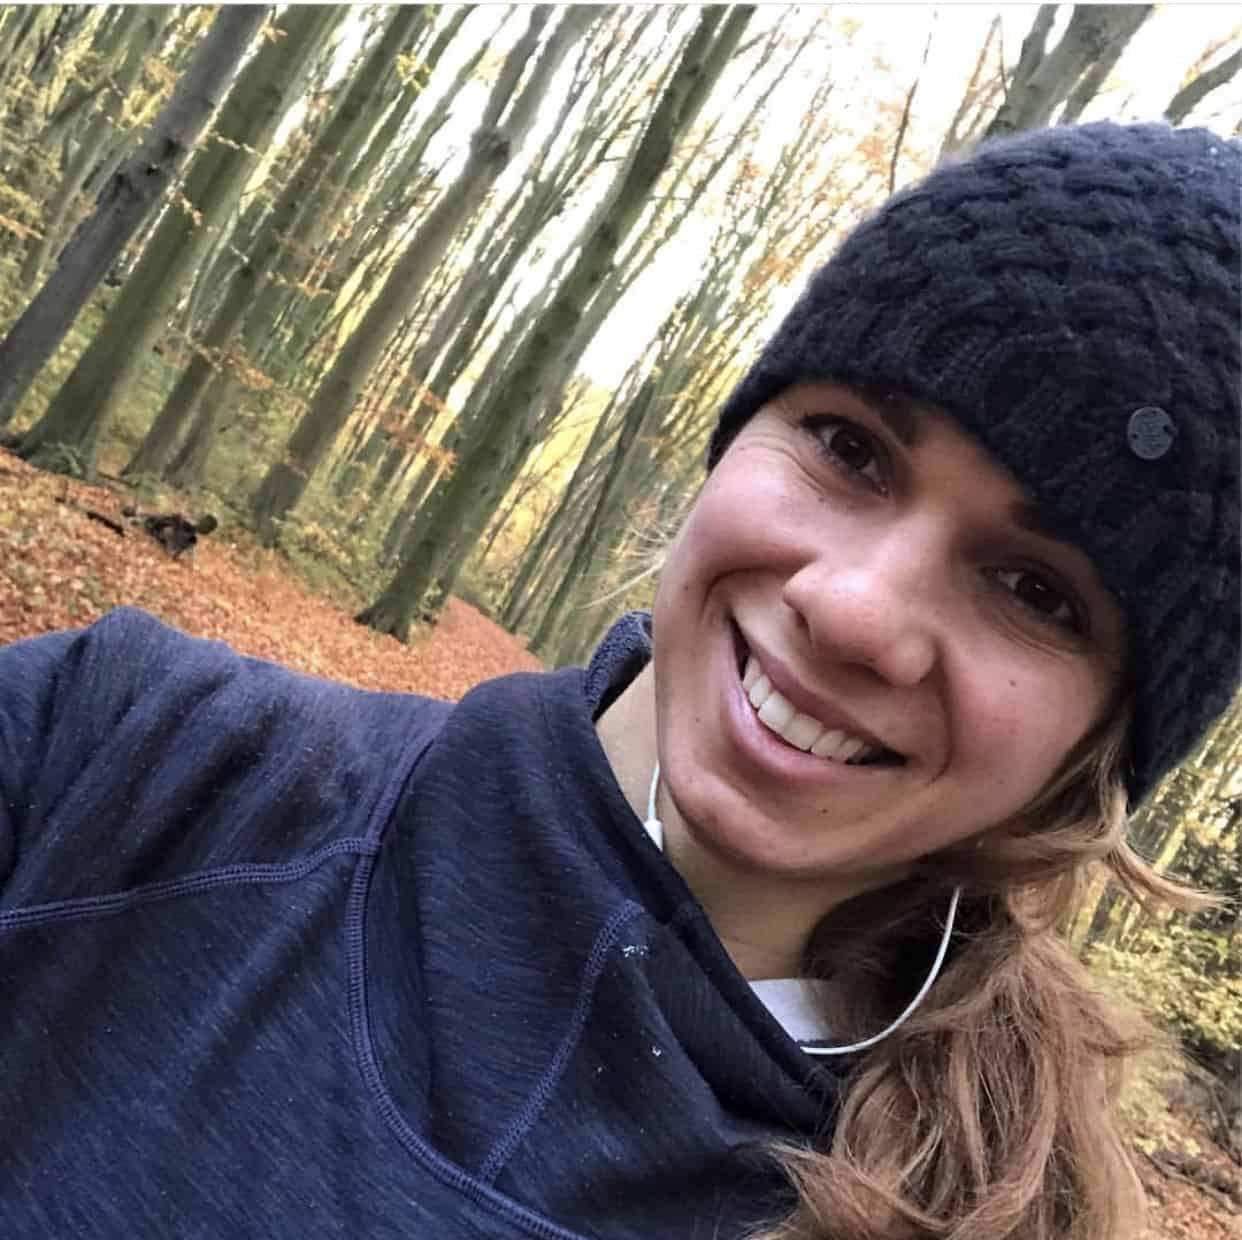 Rachel Balkovec